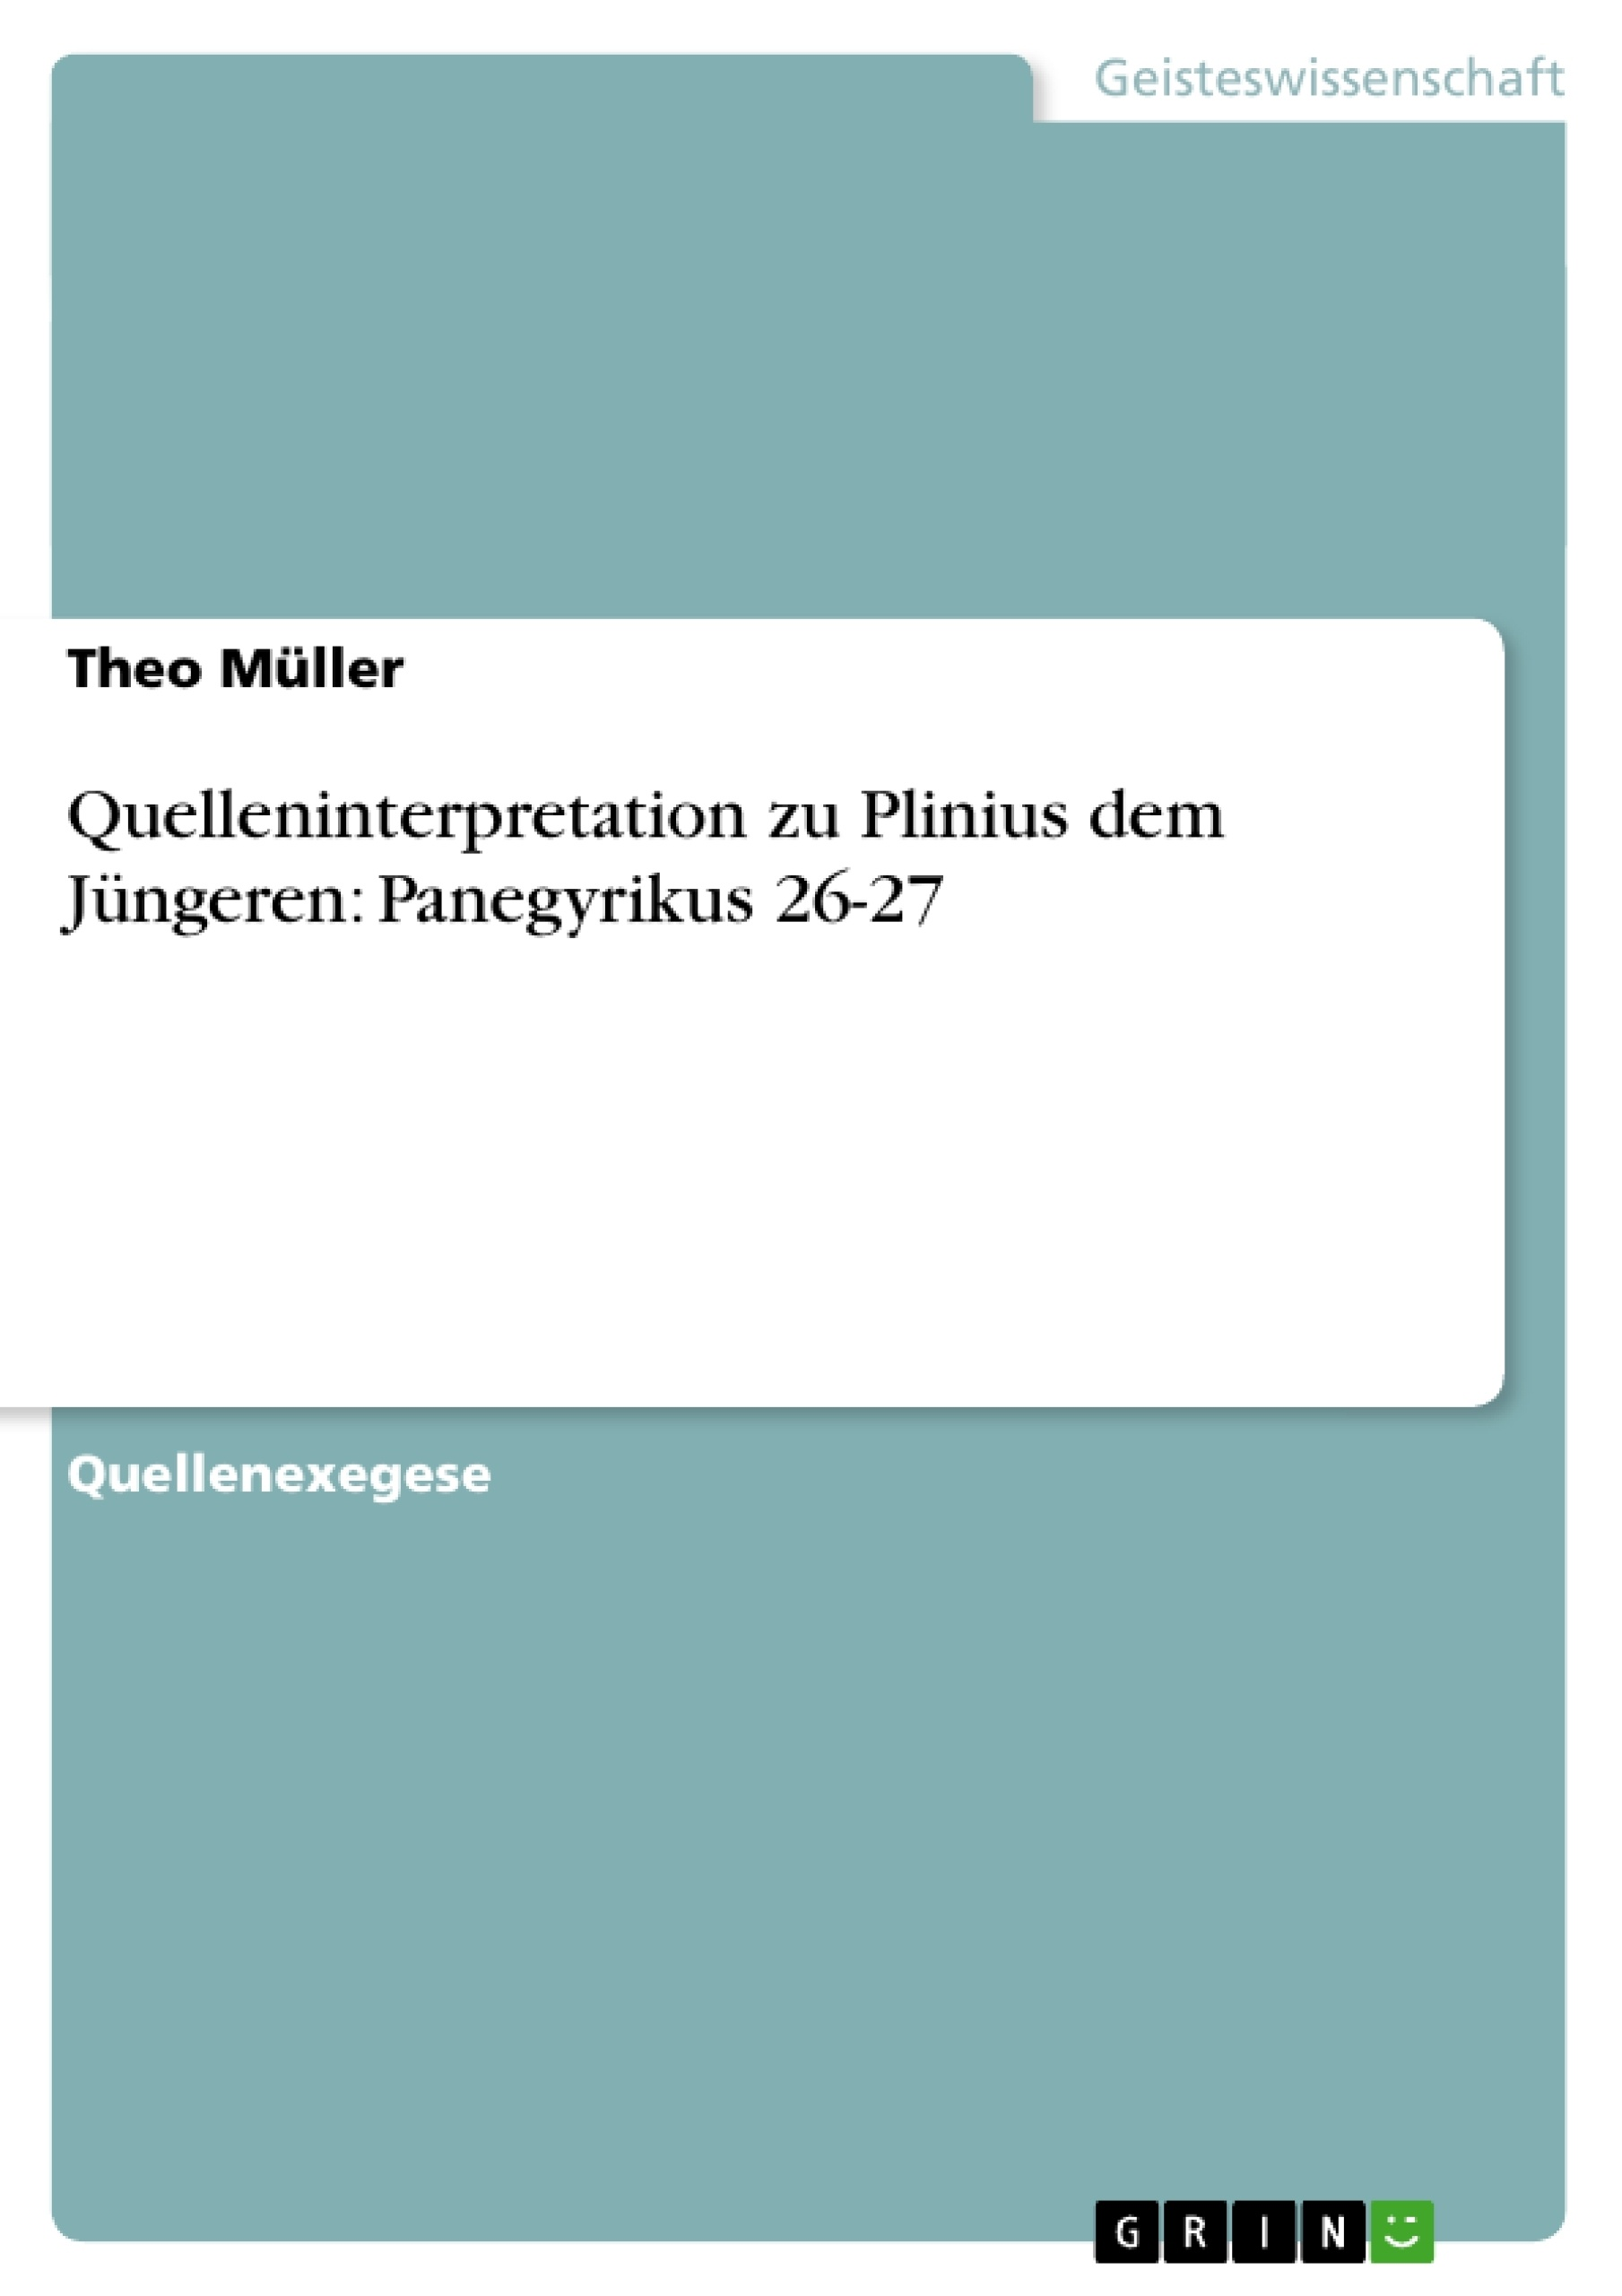 Titel: Quelleninterpretation zu Plinius dem Jüngeren: Panegyrikus 26-27